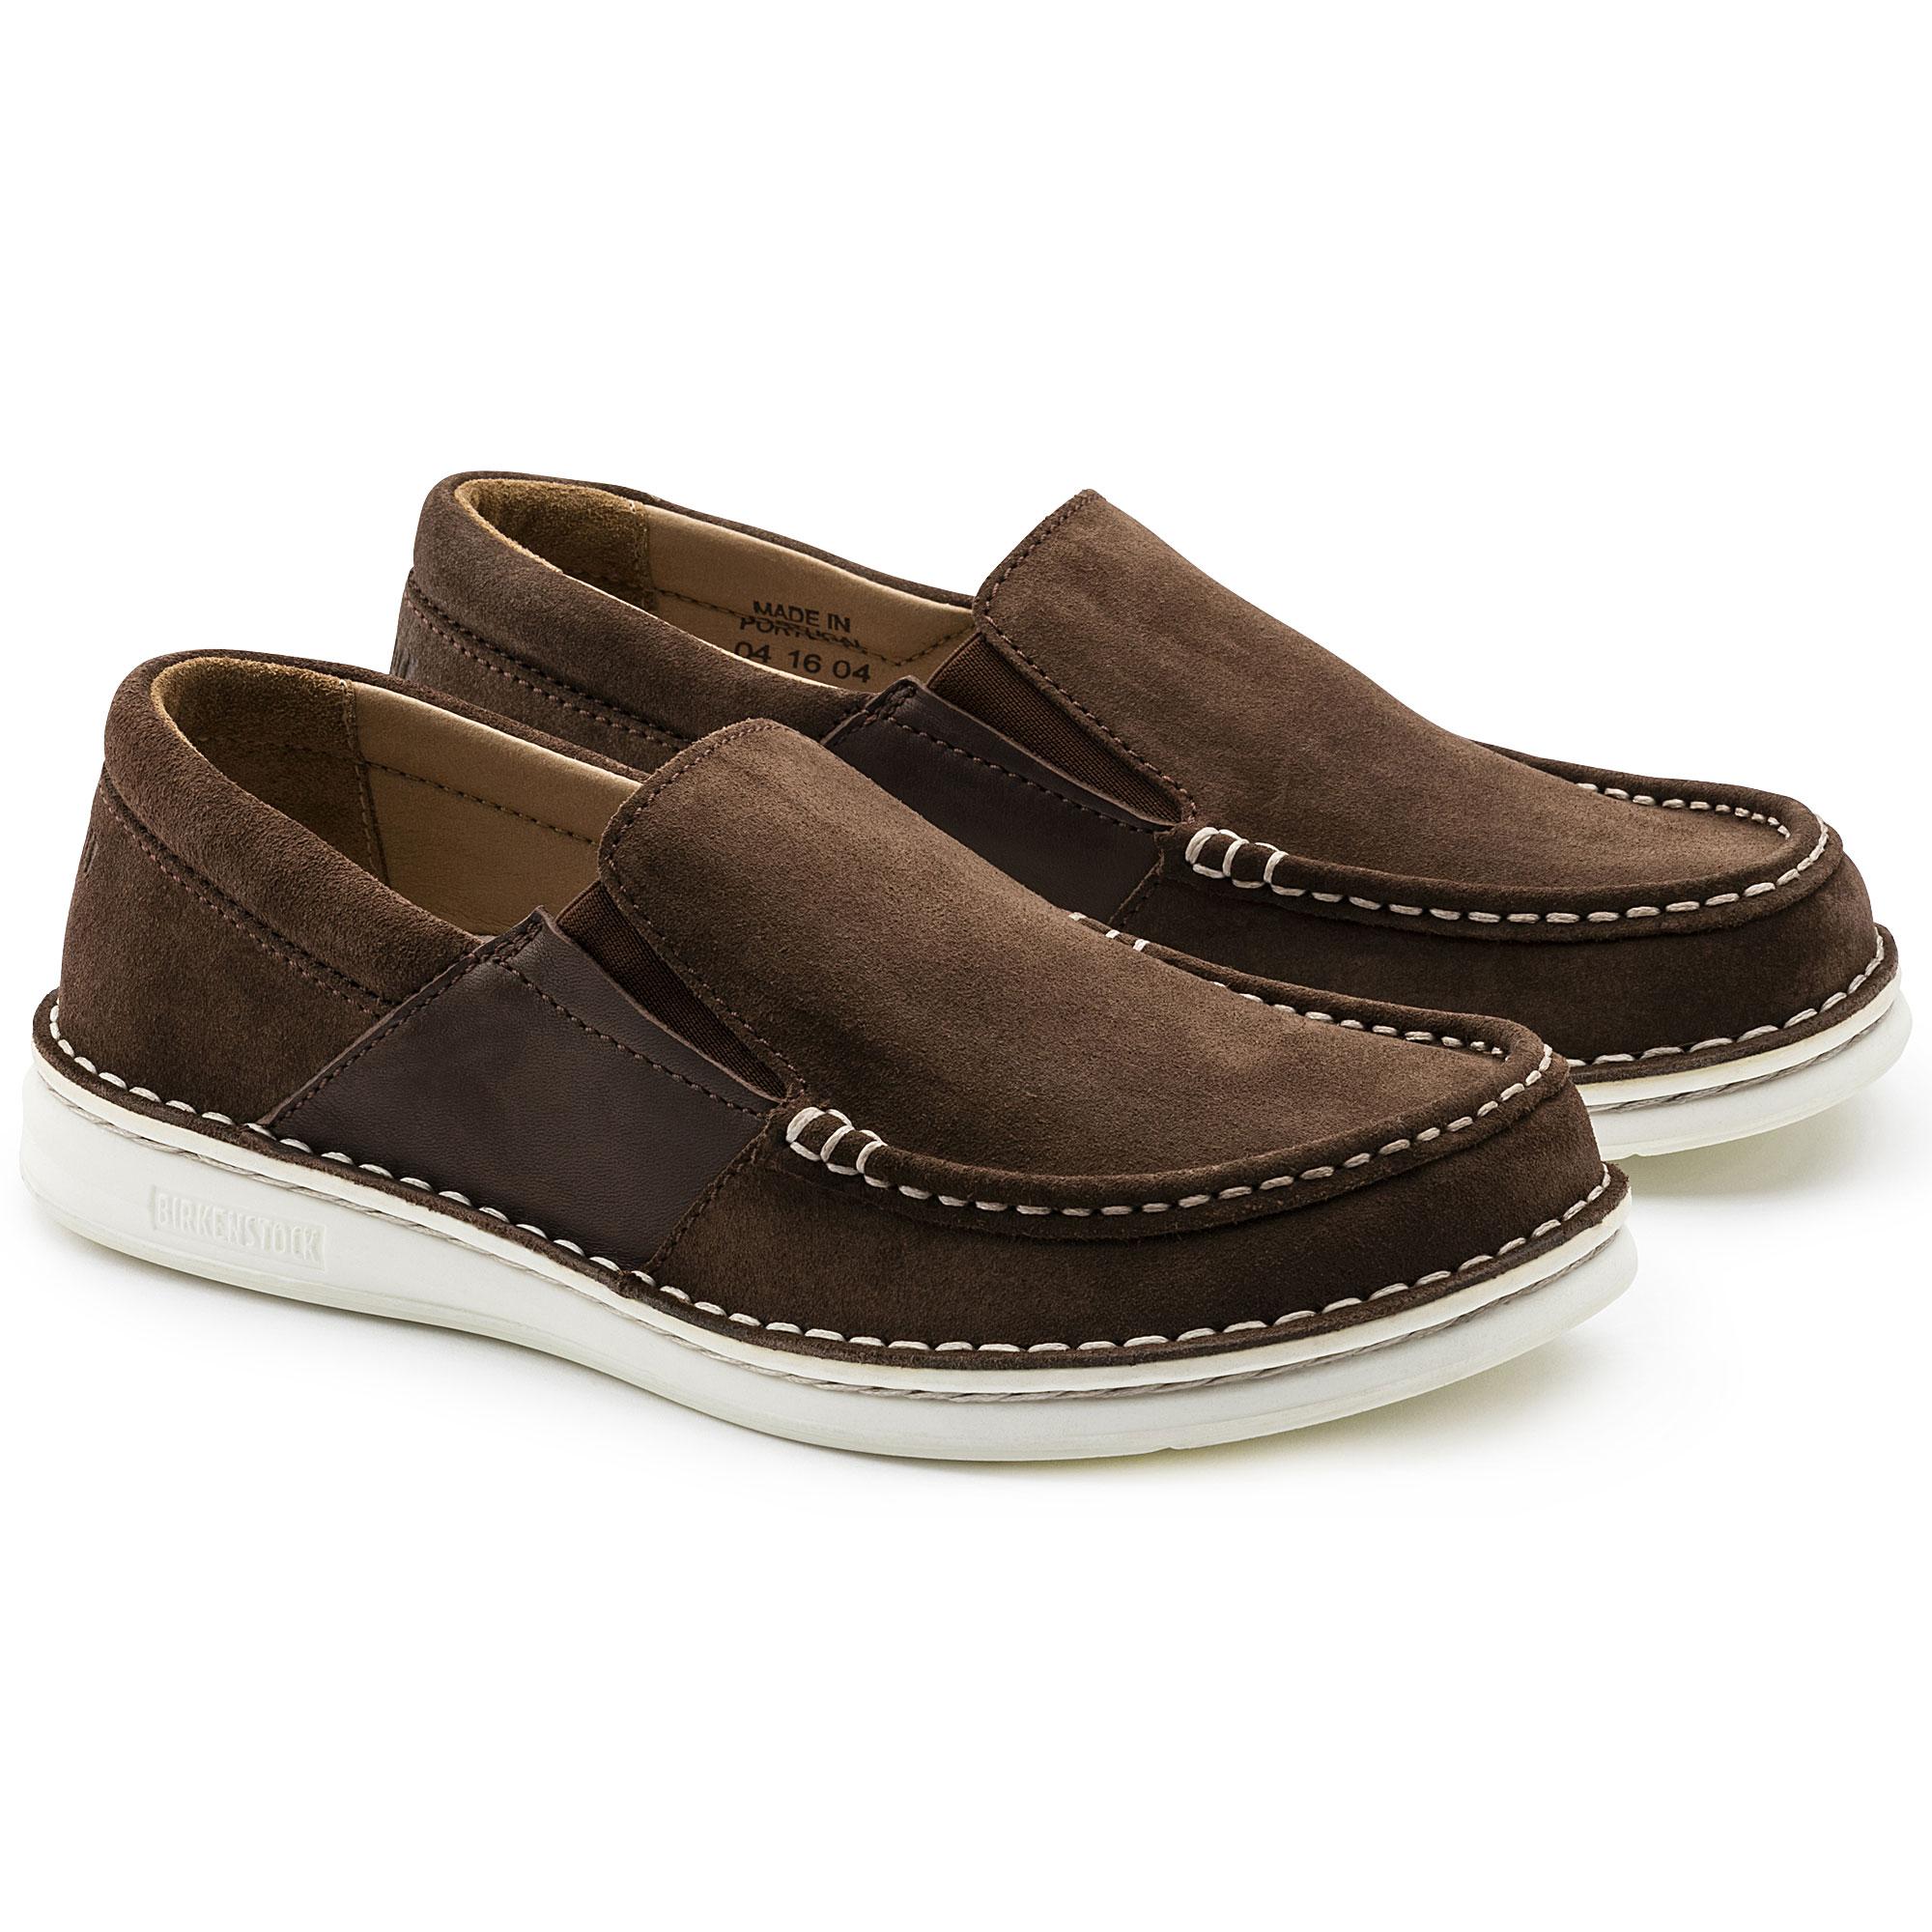 Duma Suede Leather Brown